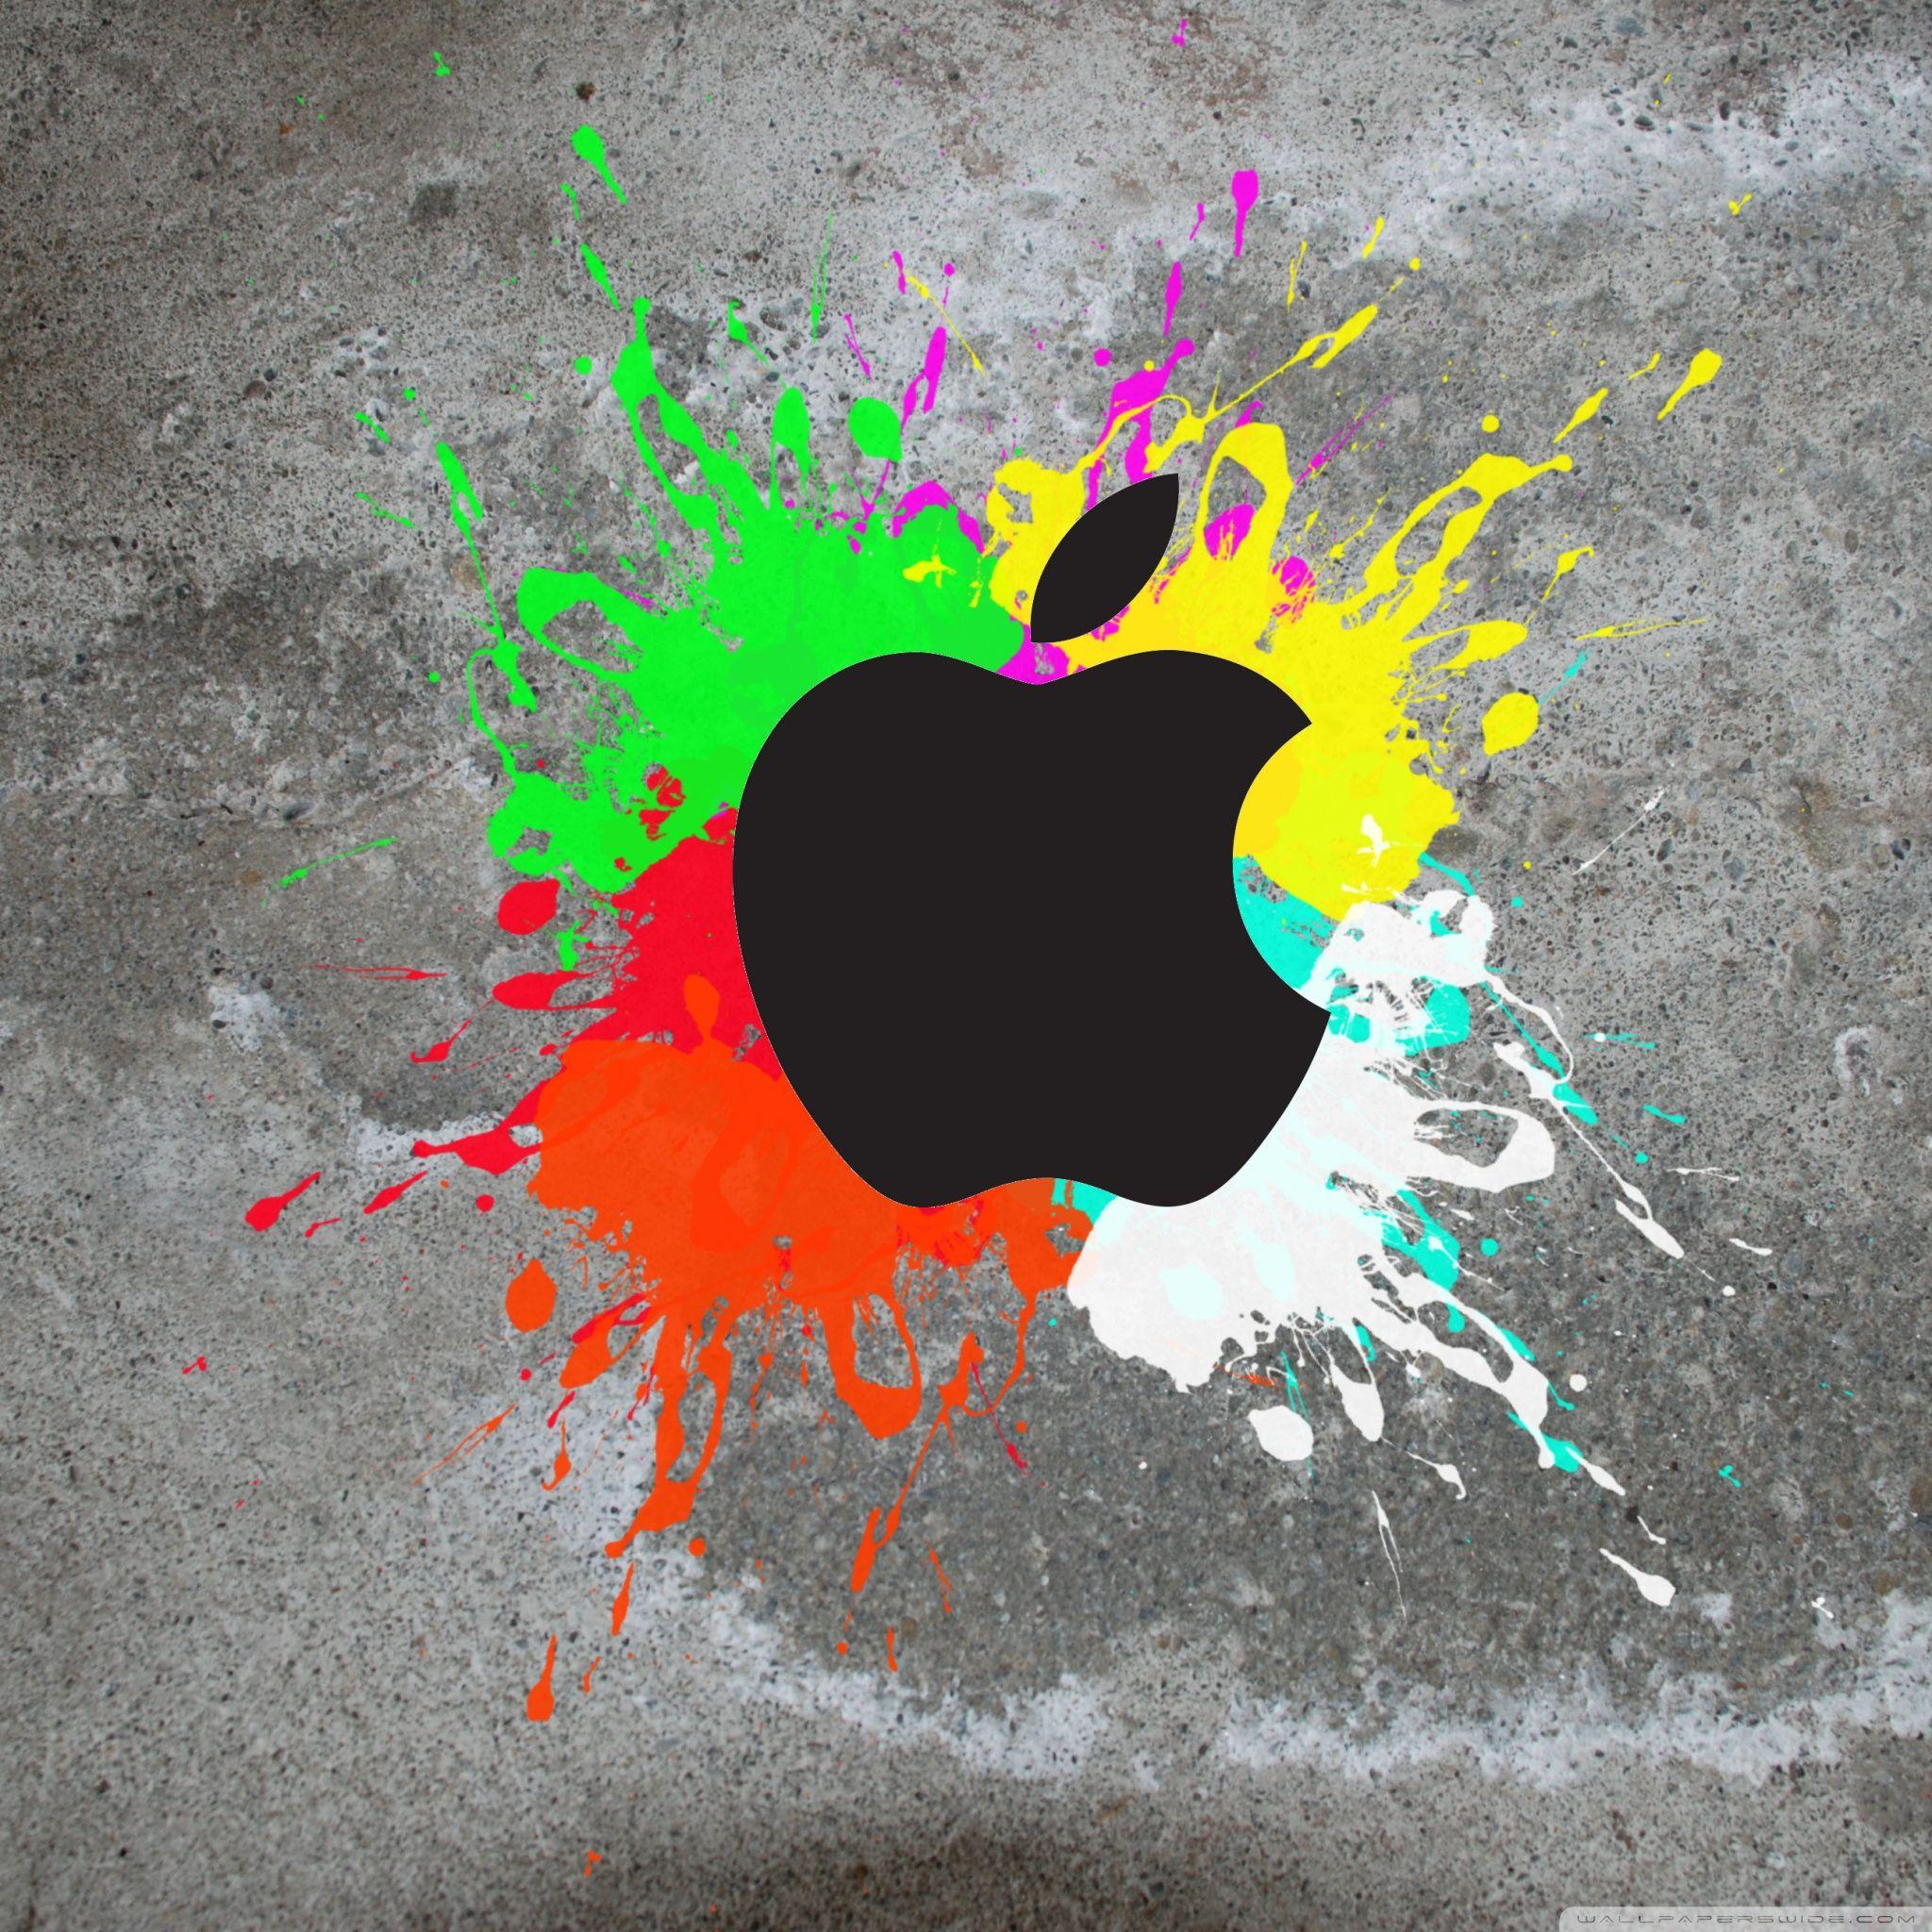 colorful apple hd desktop wallpaper widescreen high